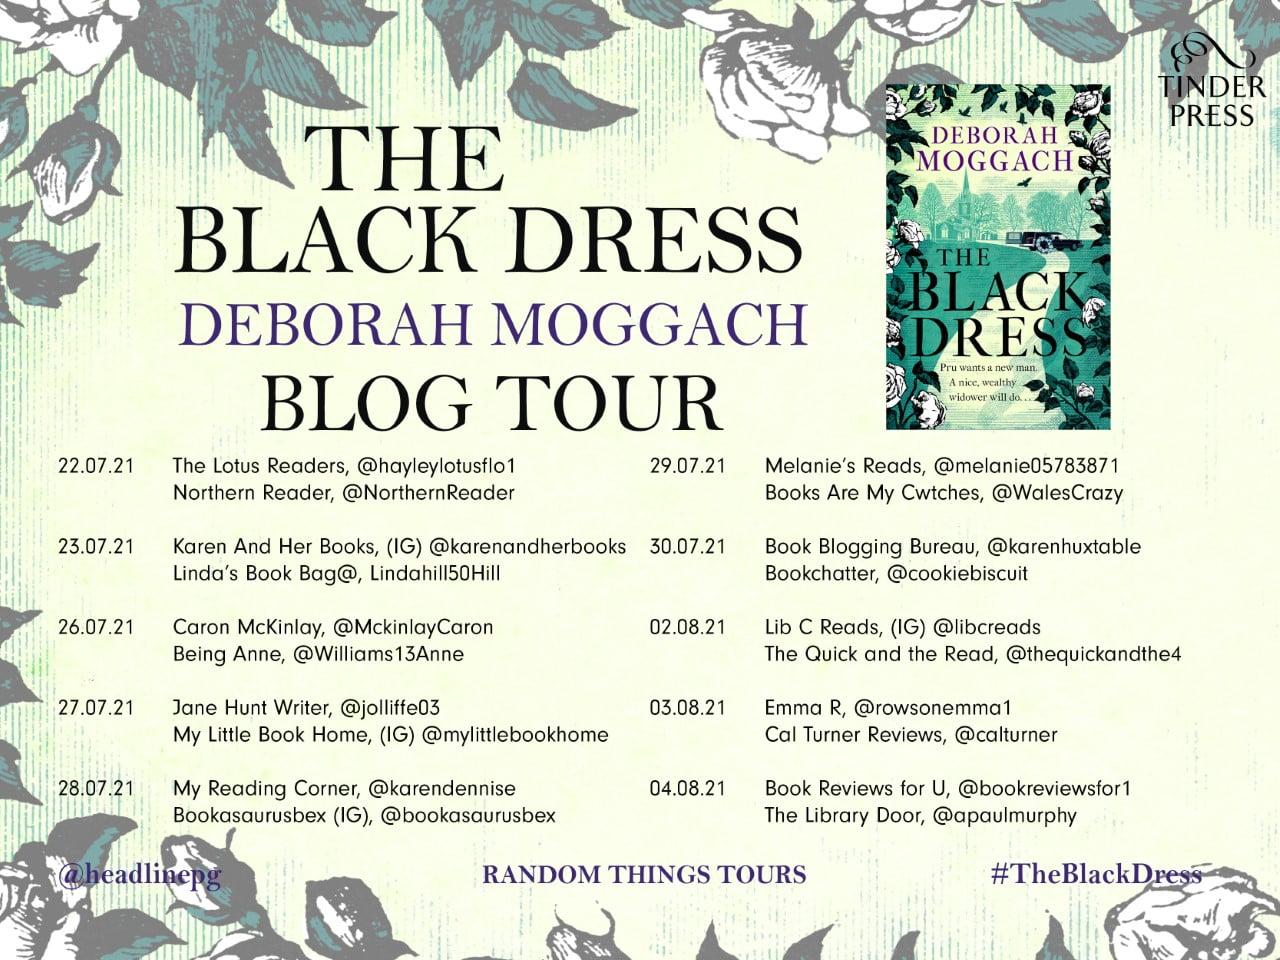 The Black Dress by Deborah Moggach online blog tour banner